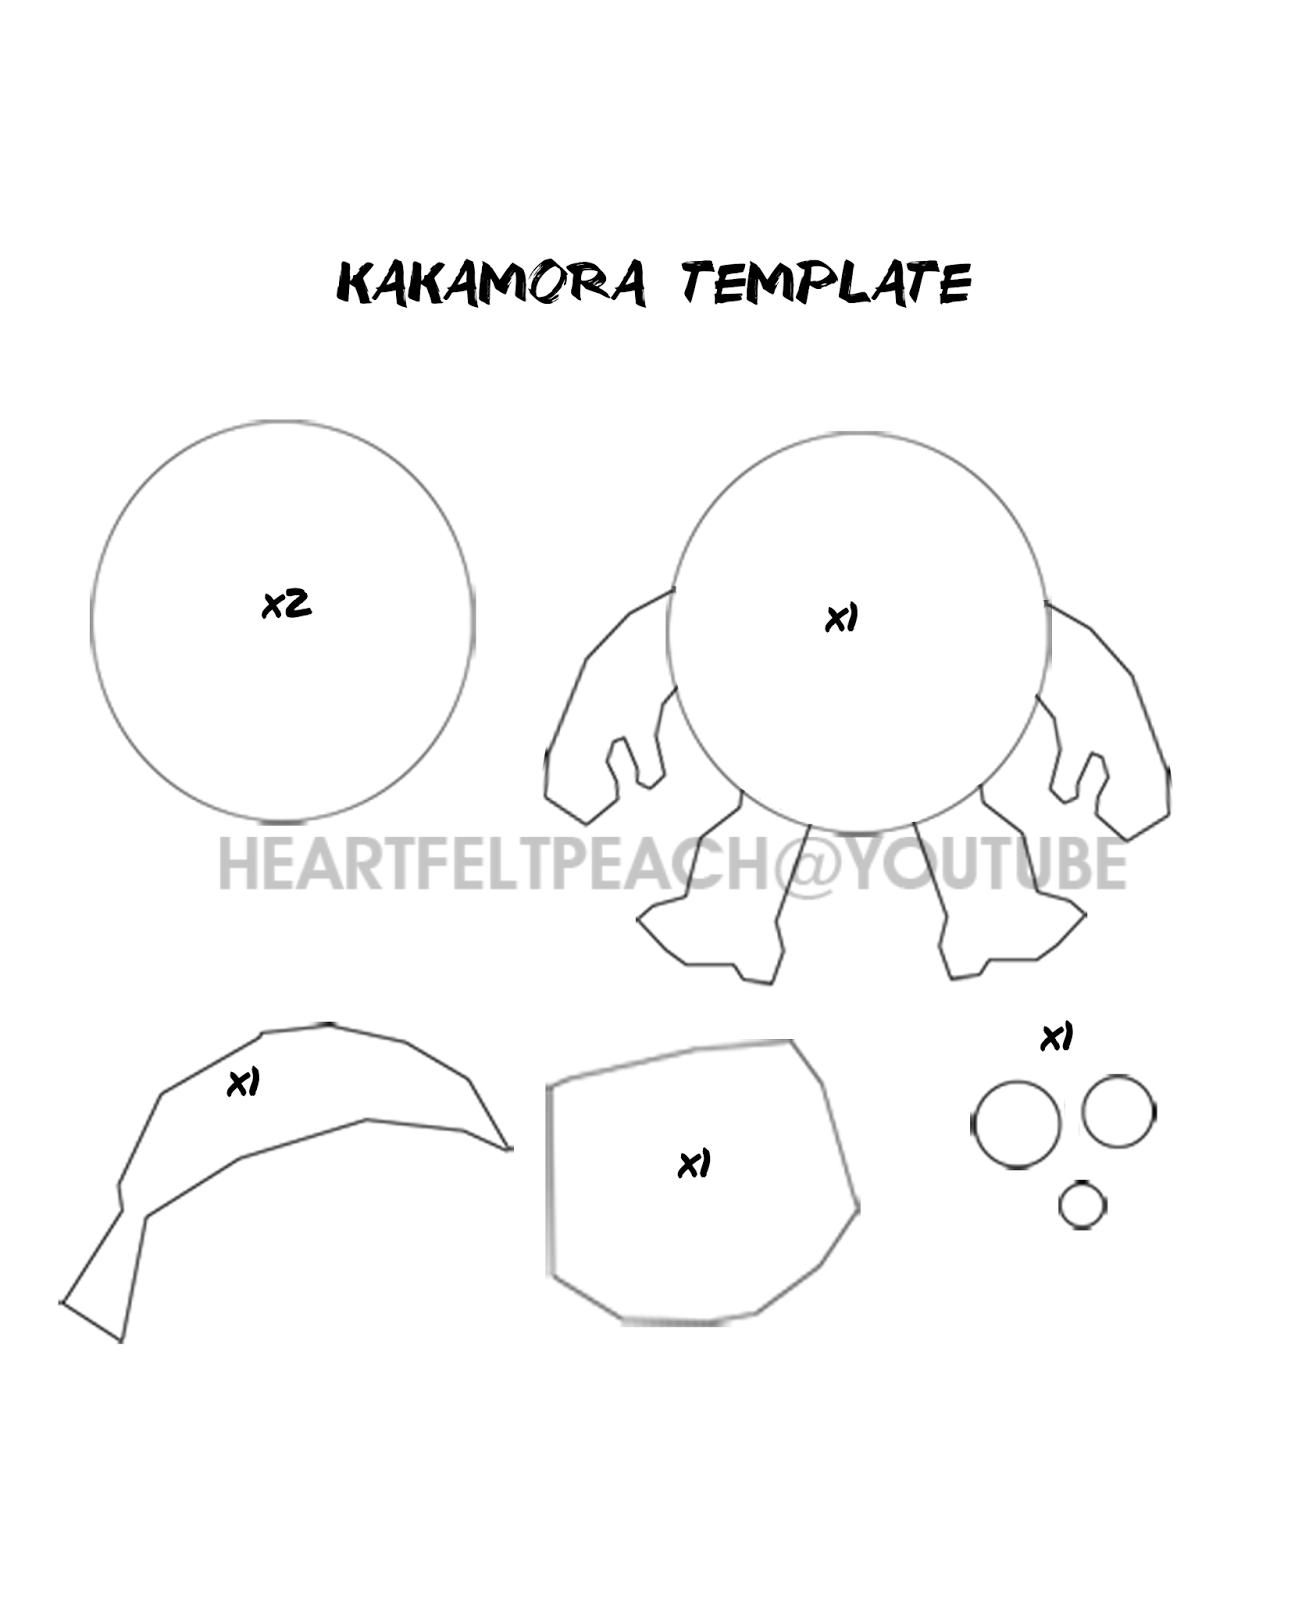 Heartfeltpeach how to make a felt moana kakamora diy tutorial template for Moana template